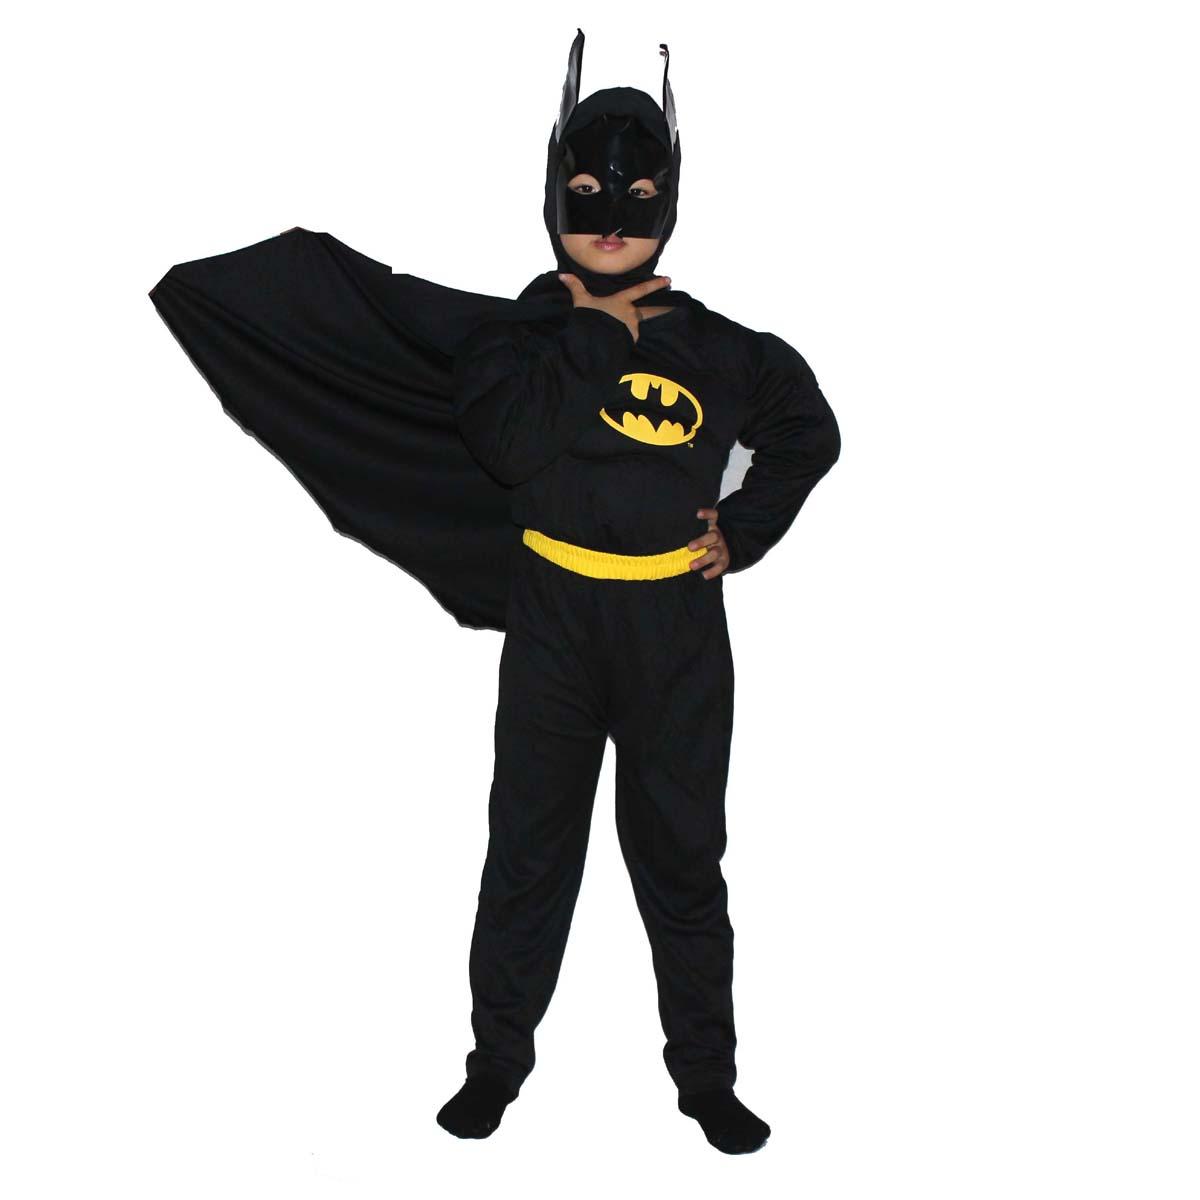 Костюм бэтмена для мальчика своими руками фото